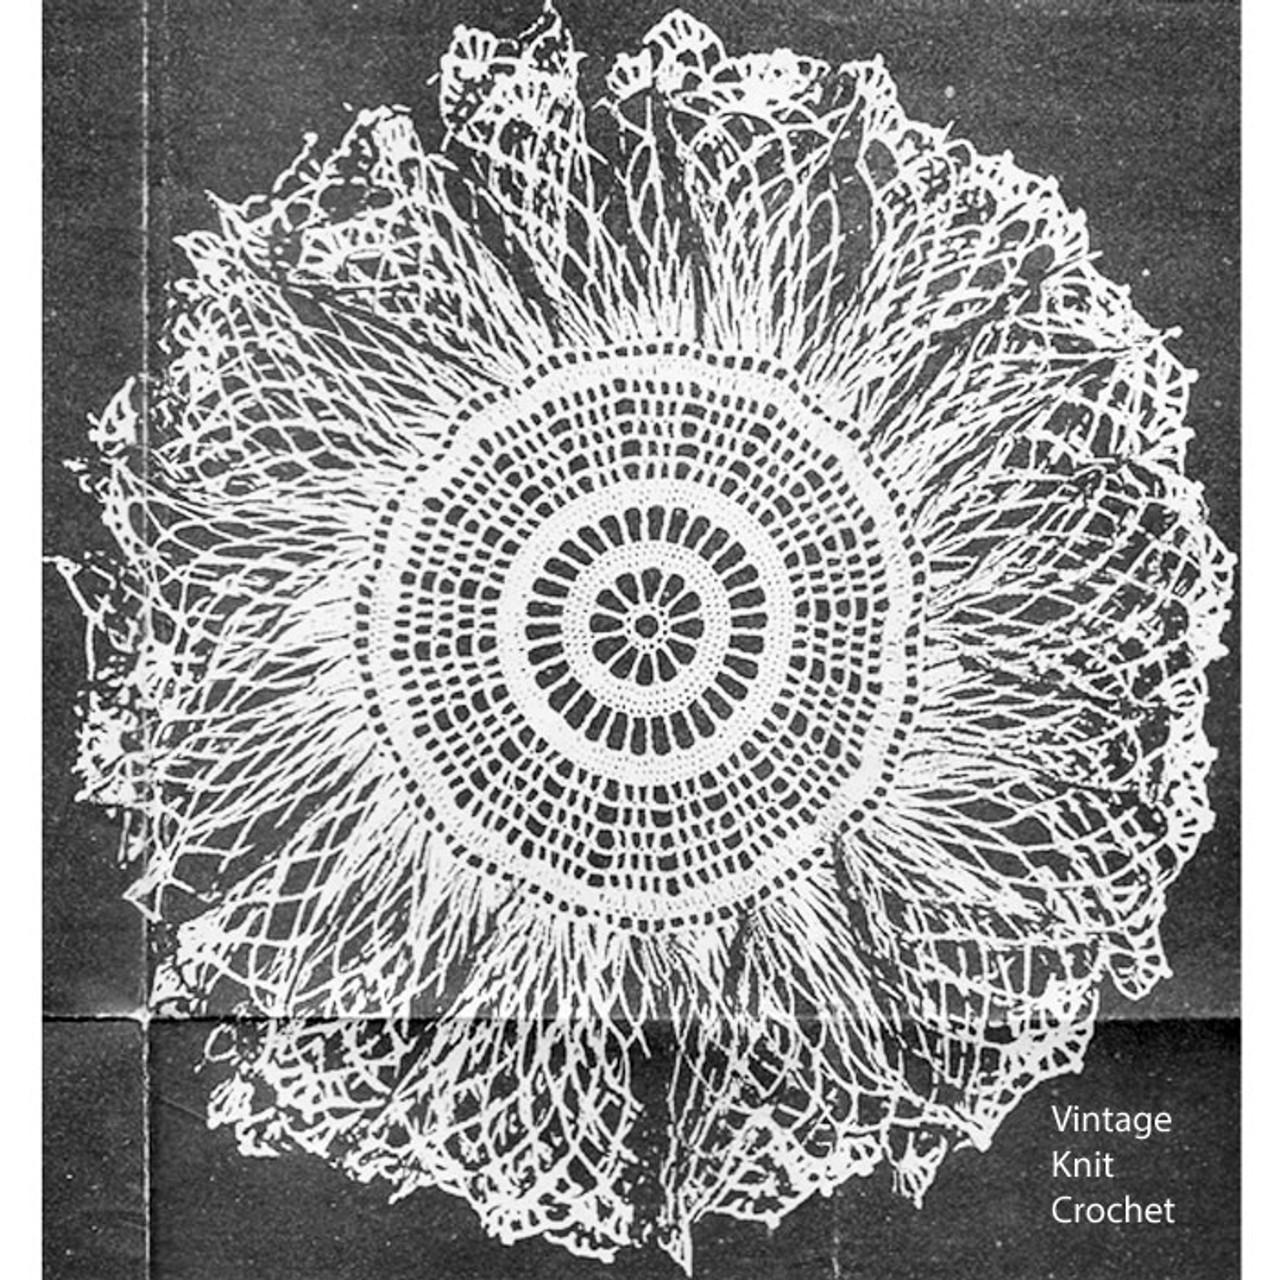 Anne Cabot Ruffled Doily Crochet Pattern